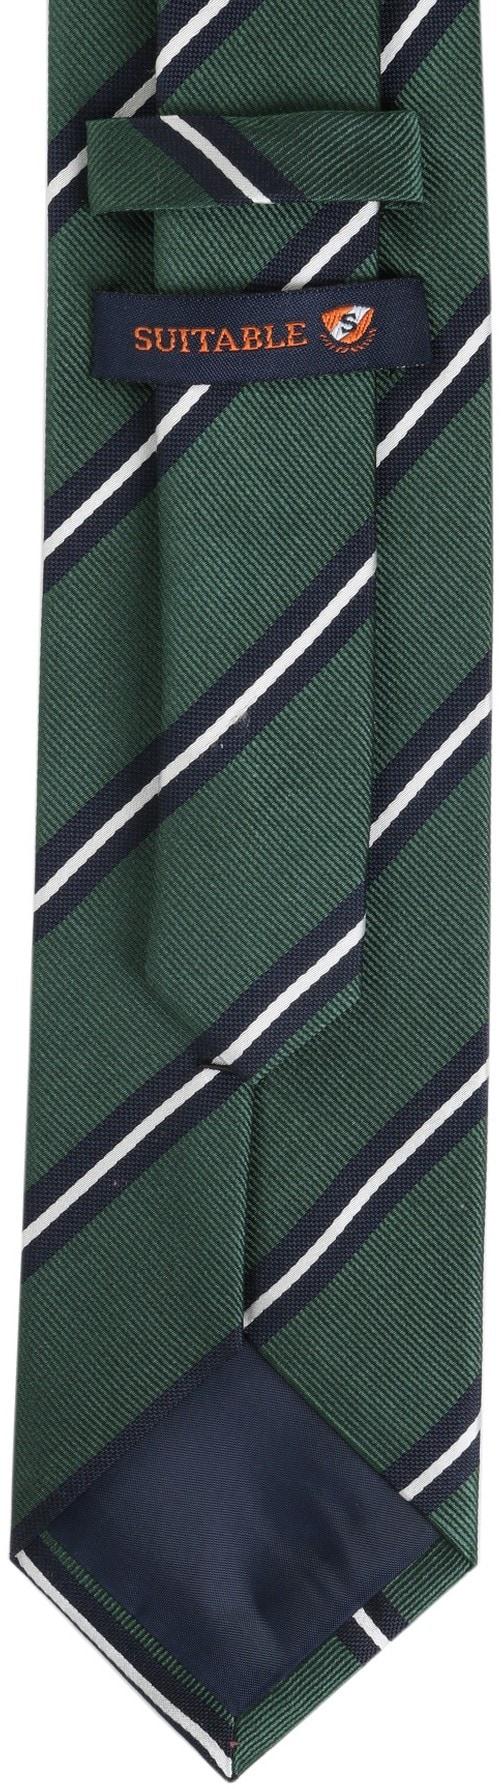 Krawatte Seide Grün Streifen foto 3